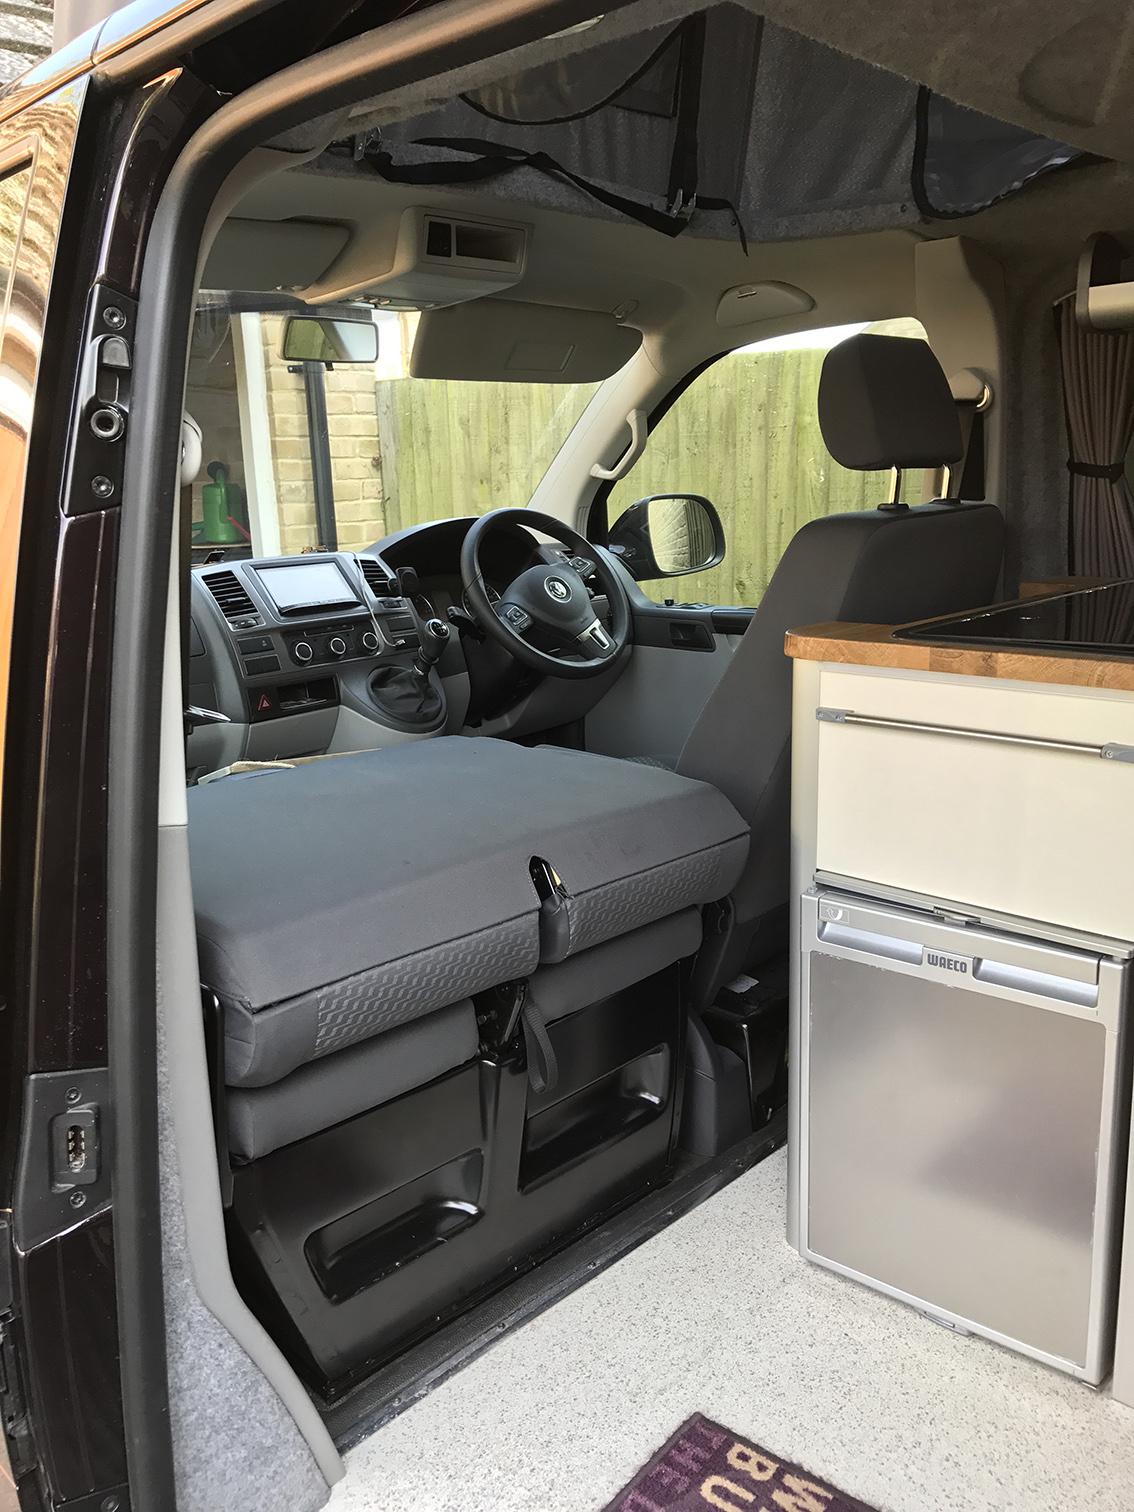 Folding T5 Double Front Seat Conversion